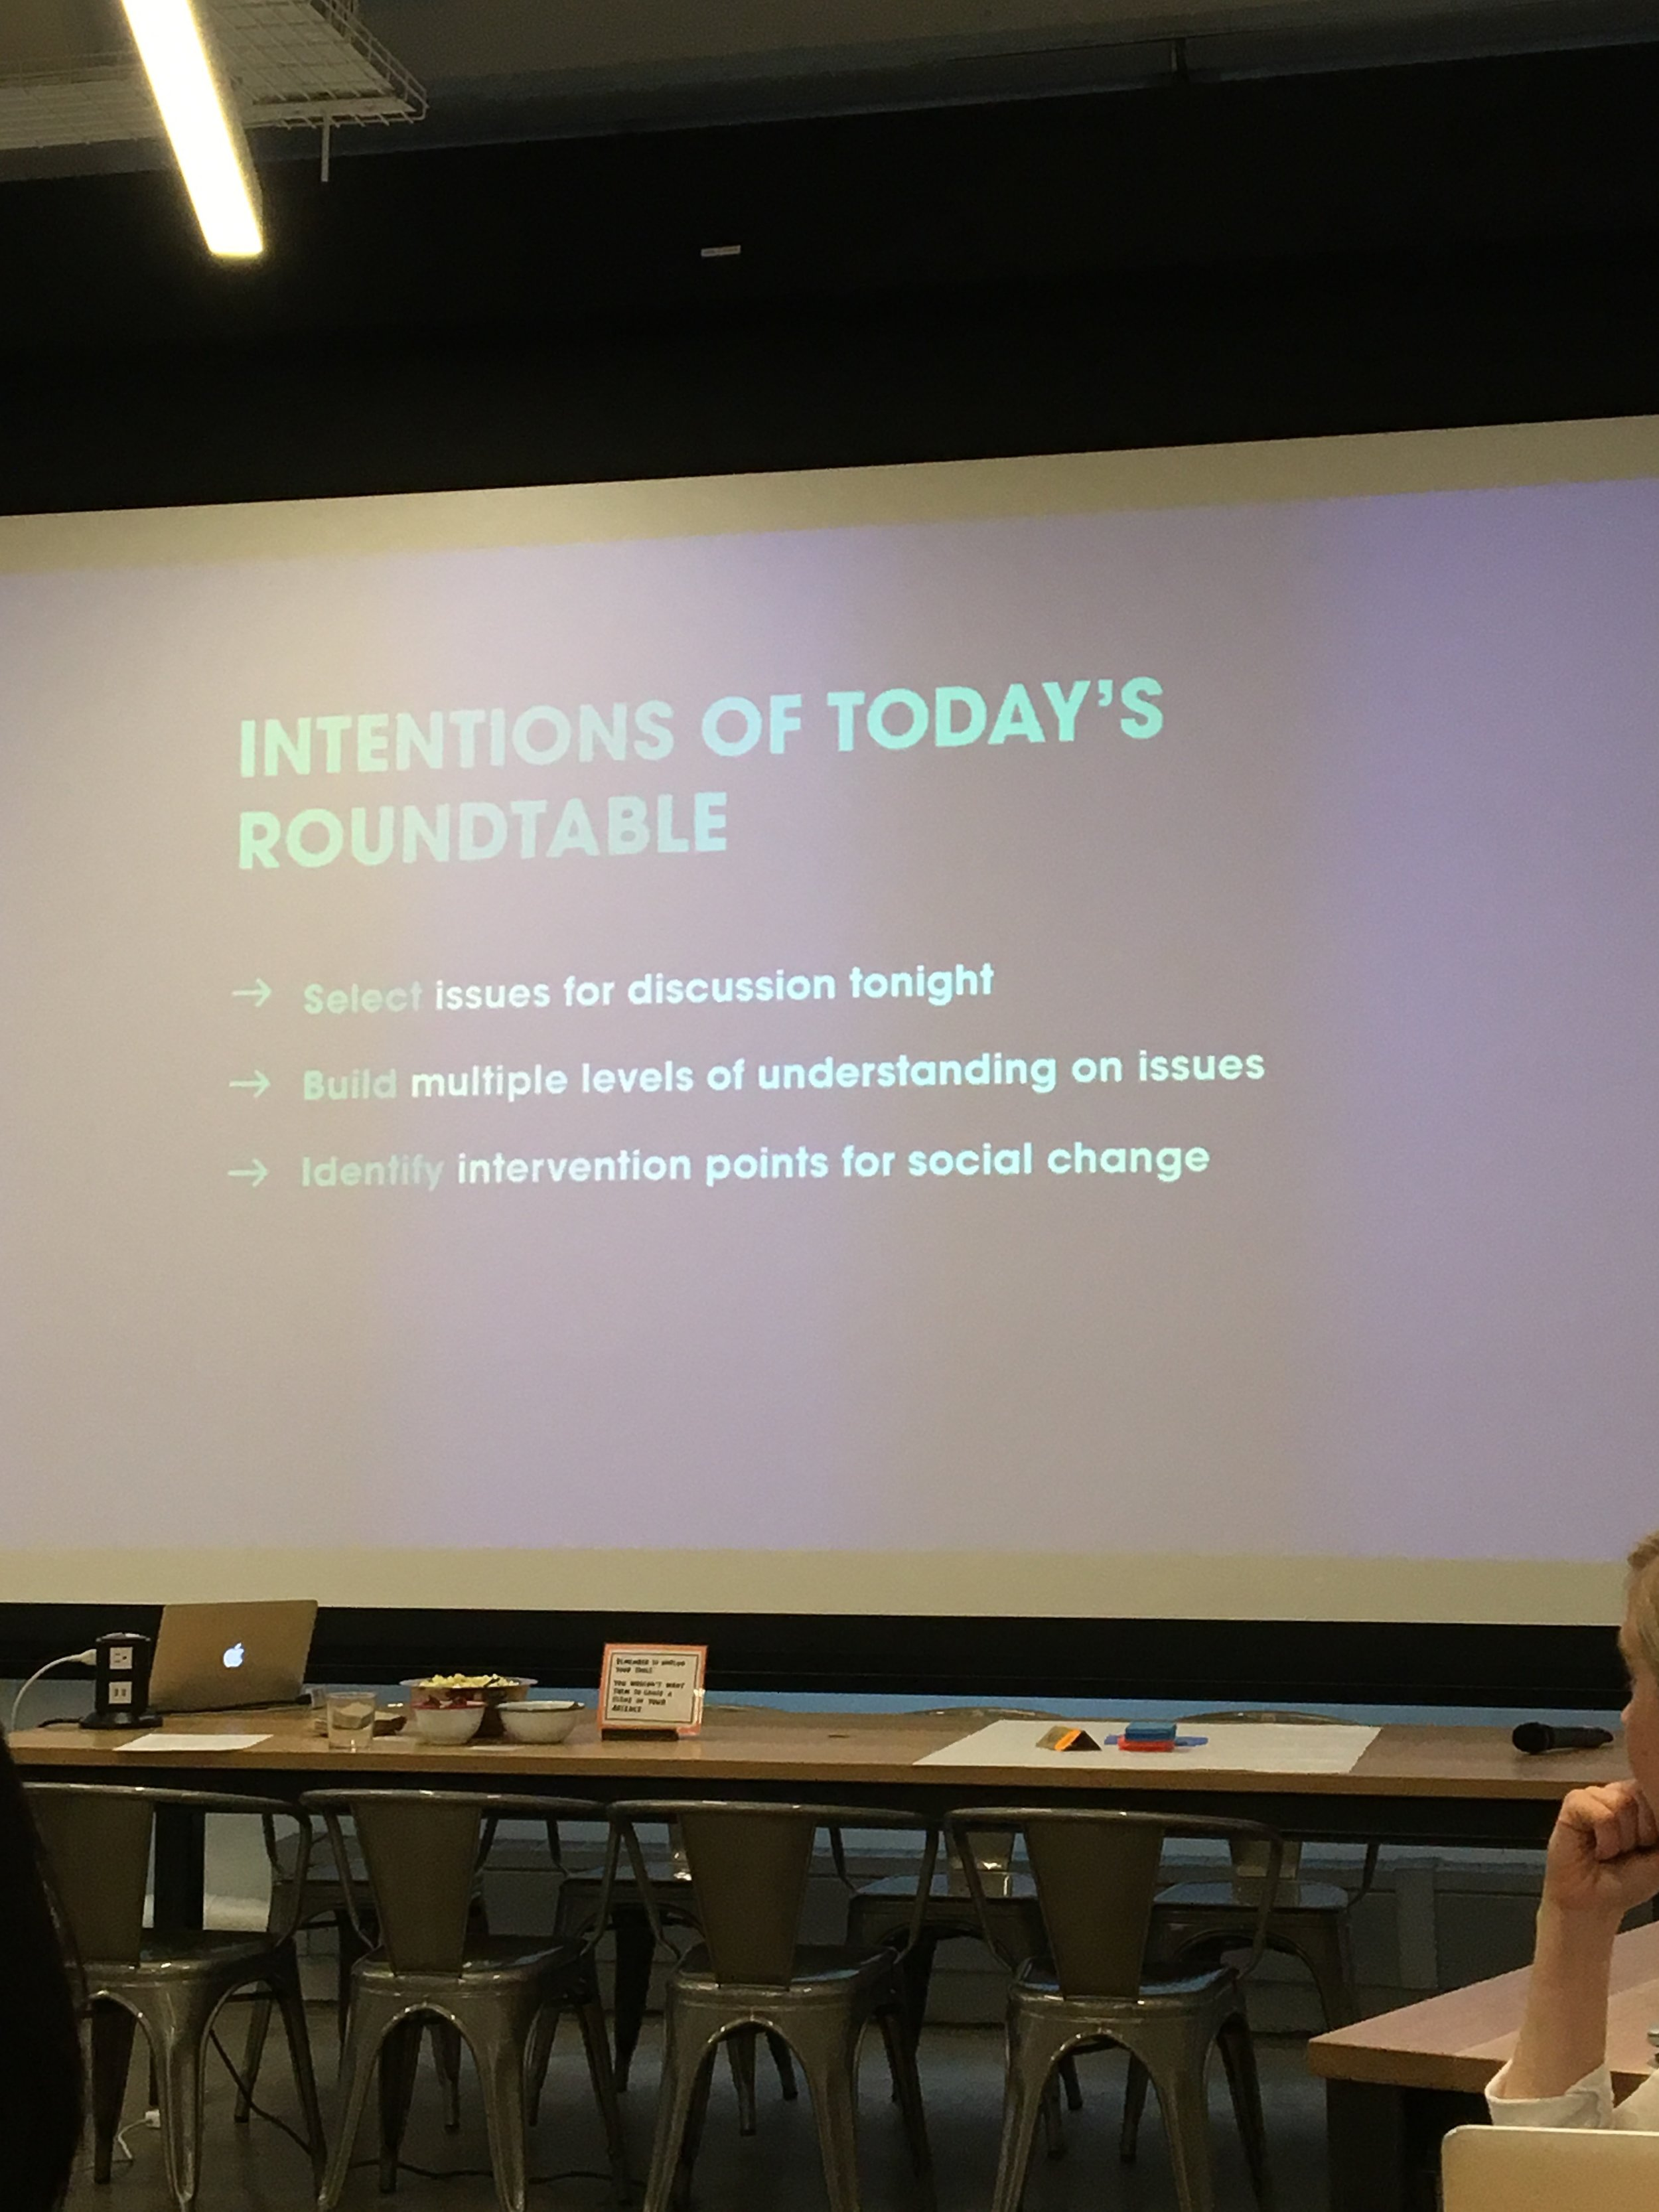 Tonight's Roundtable Goals